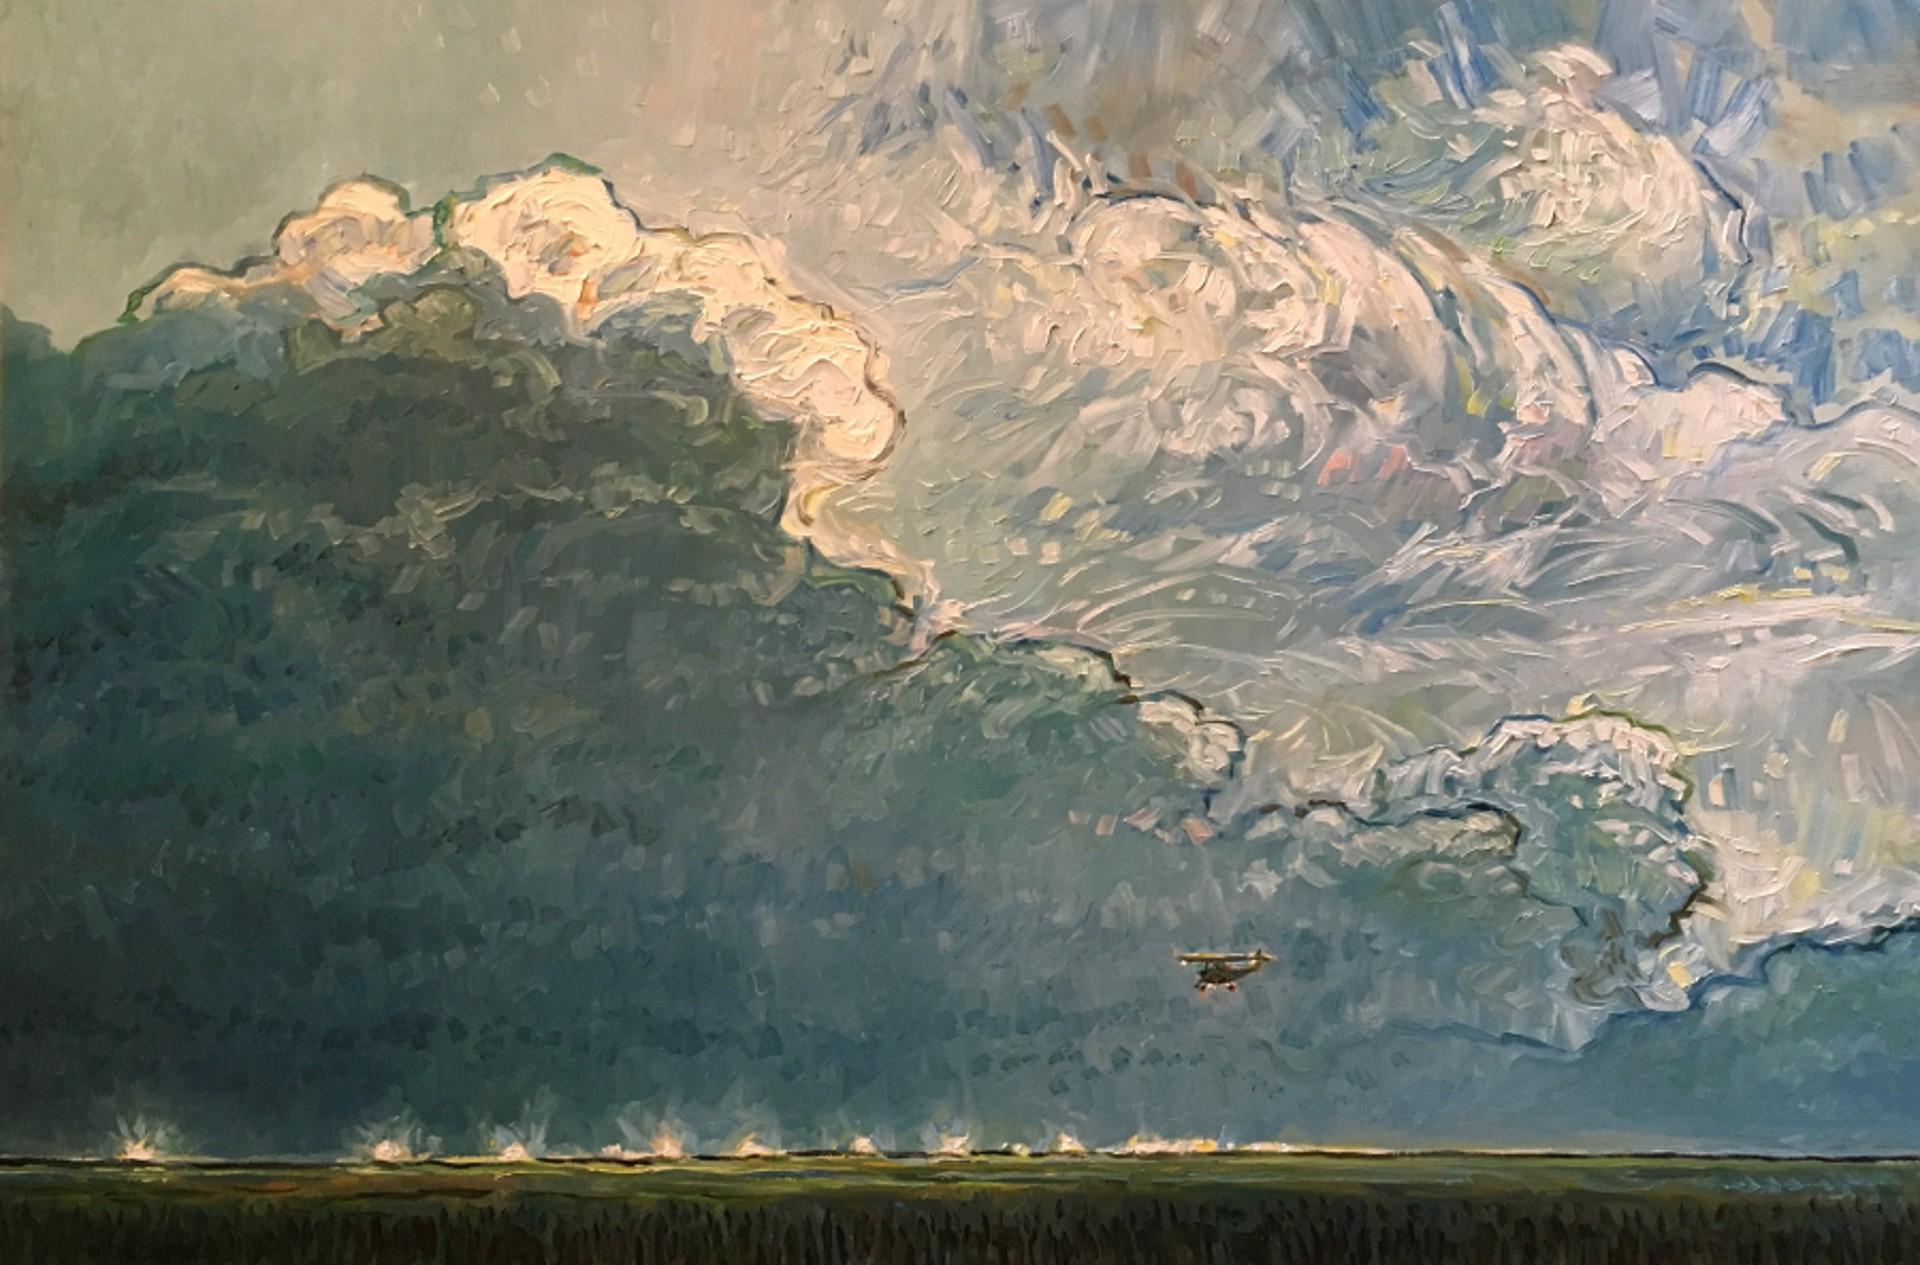 Gentle Descent by Steve Coffey